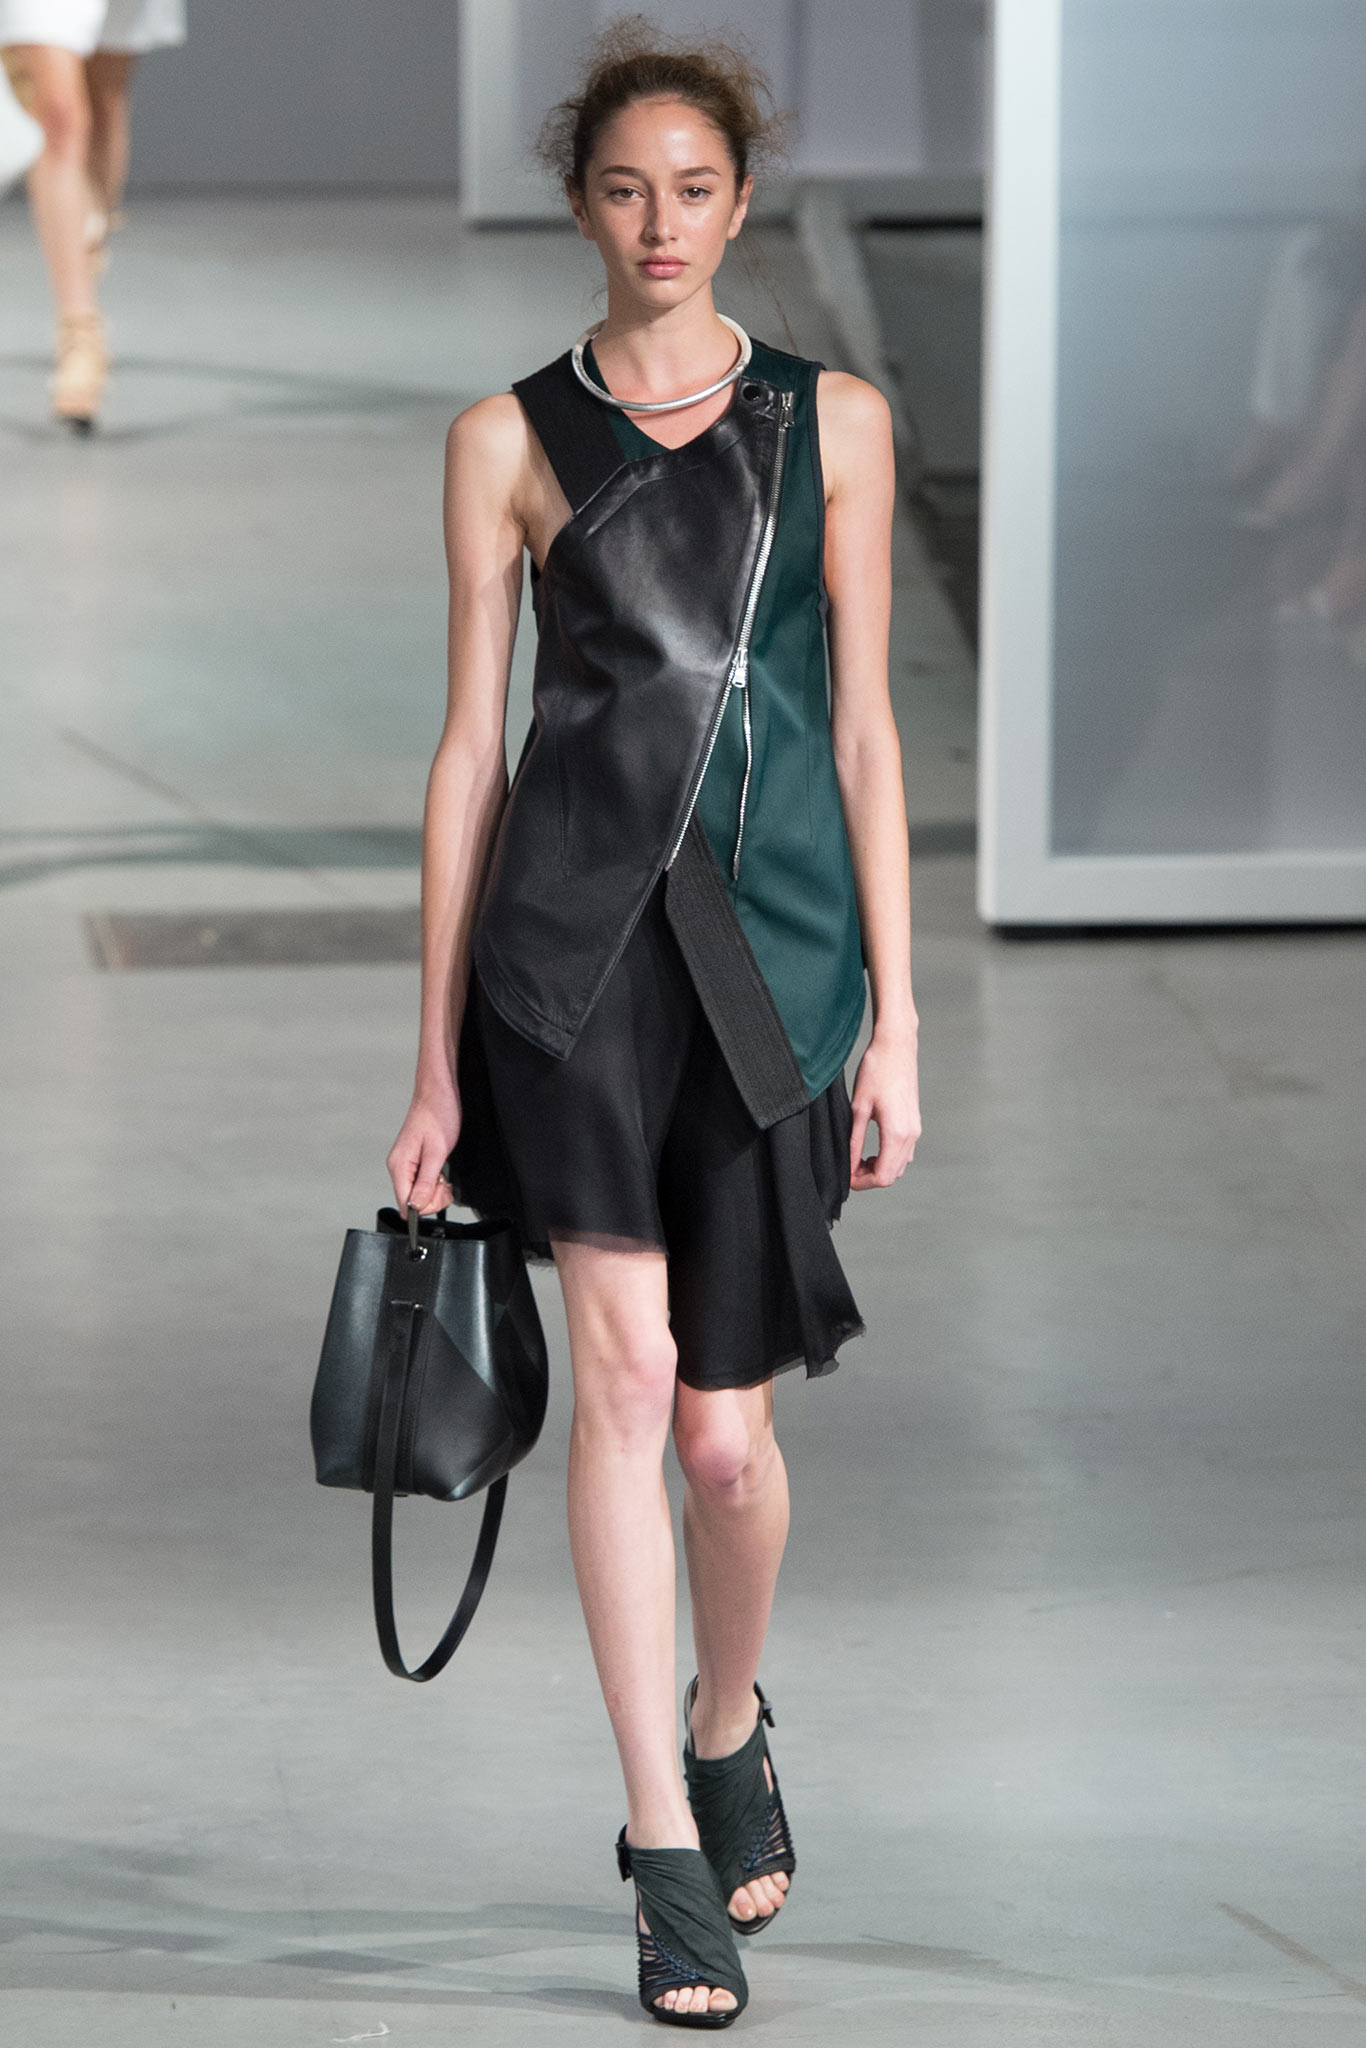 3.1 phillip lim spring / summer rtw – new york fashion week